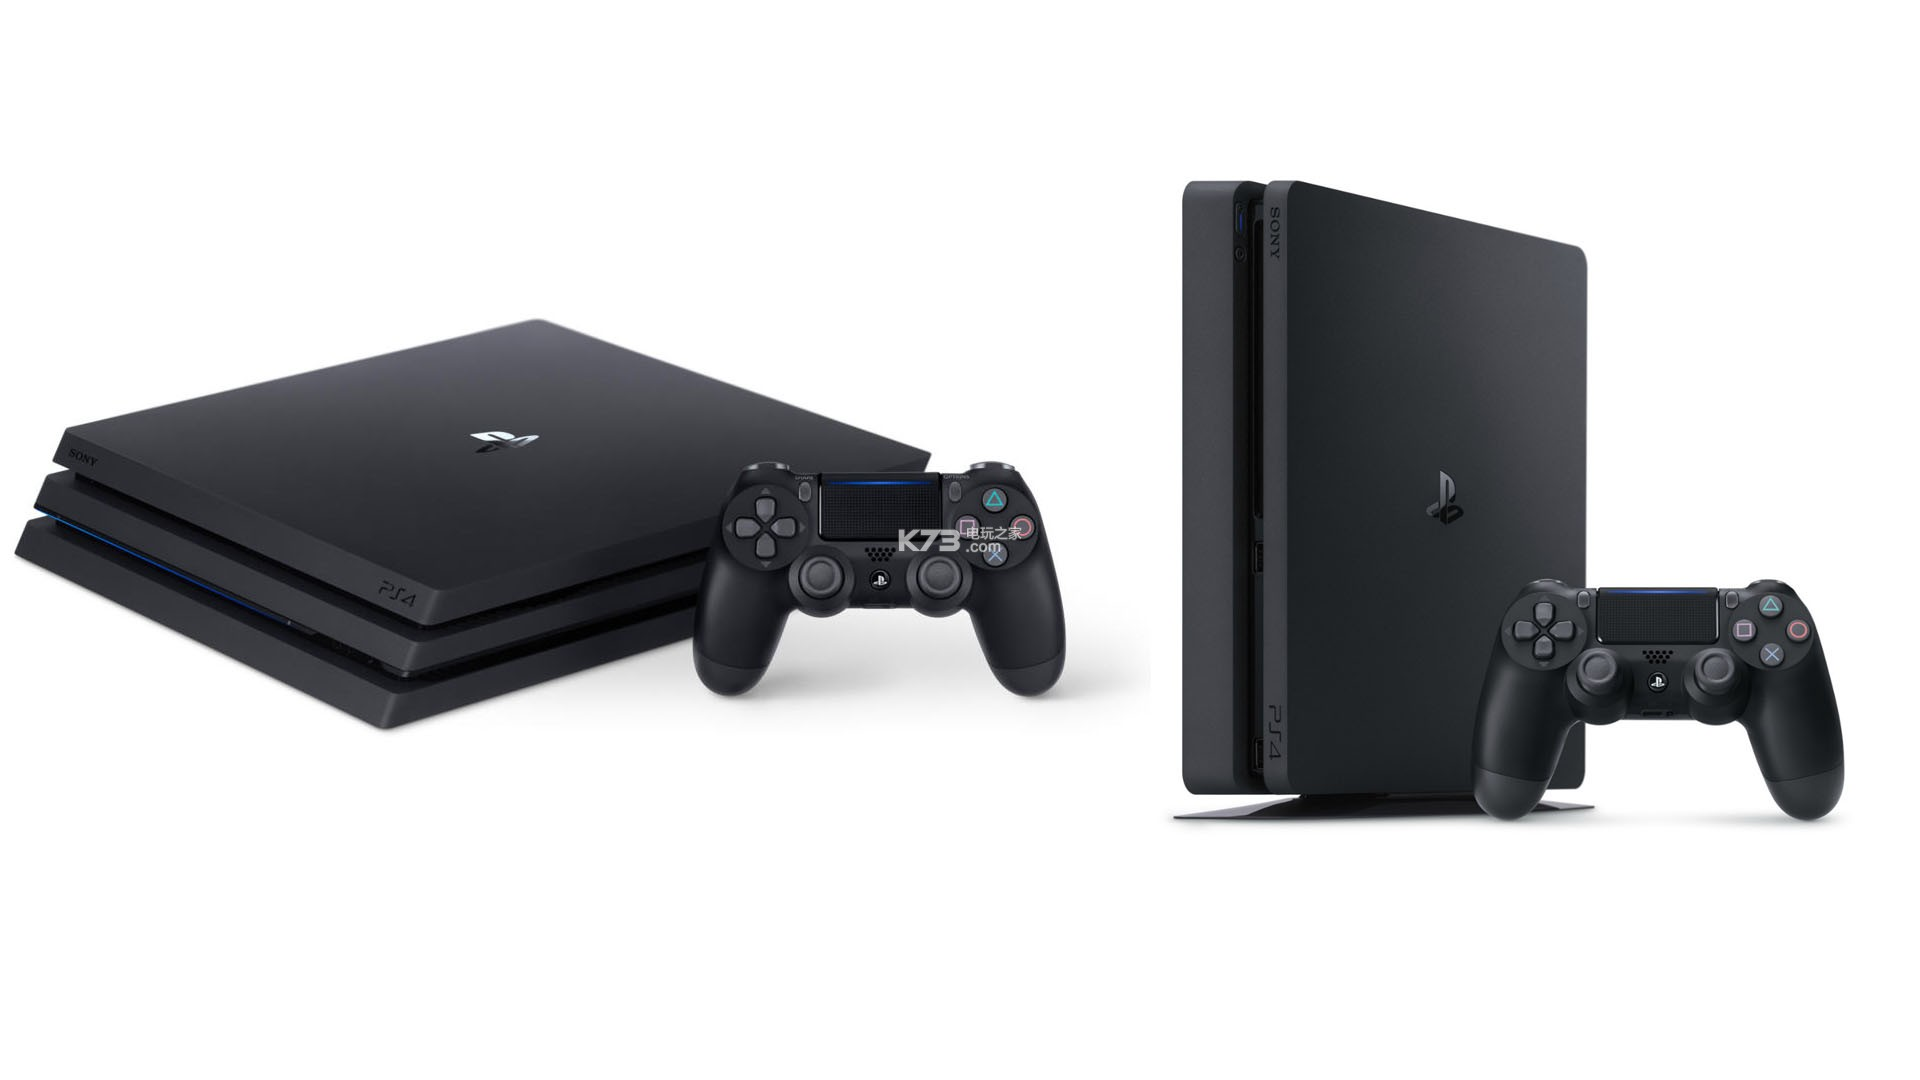 PS4 Pro&PS4 Slim国行确认 上市日期未公布